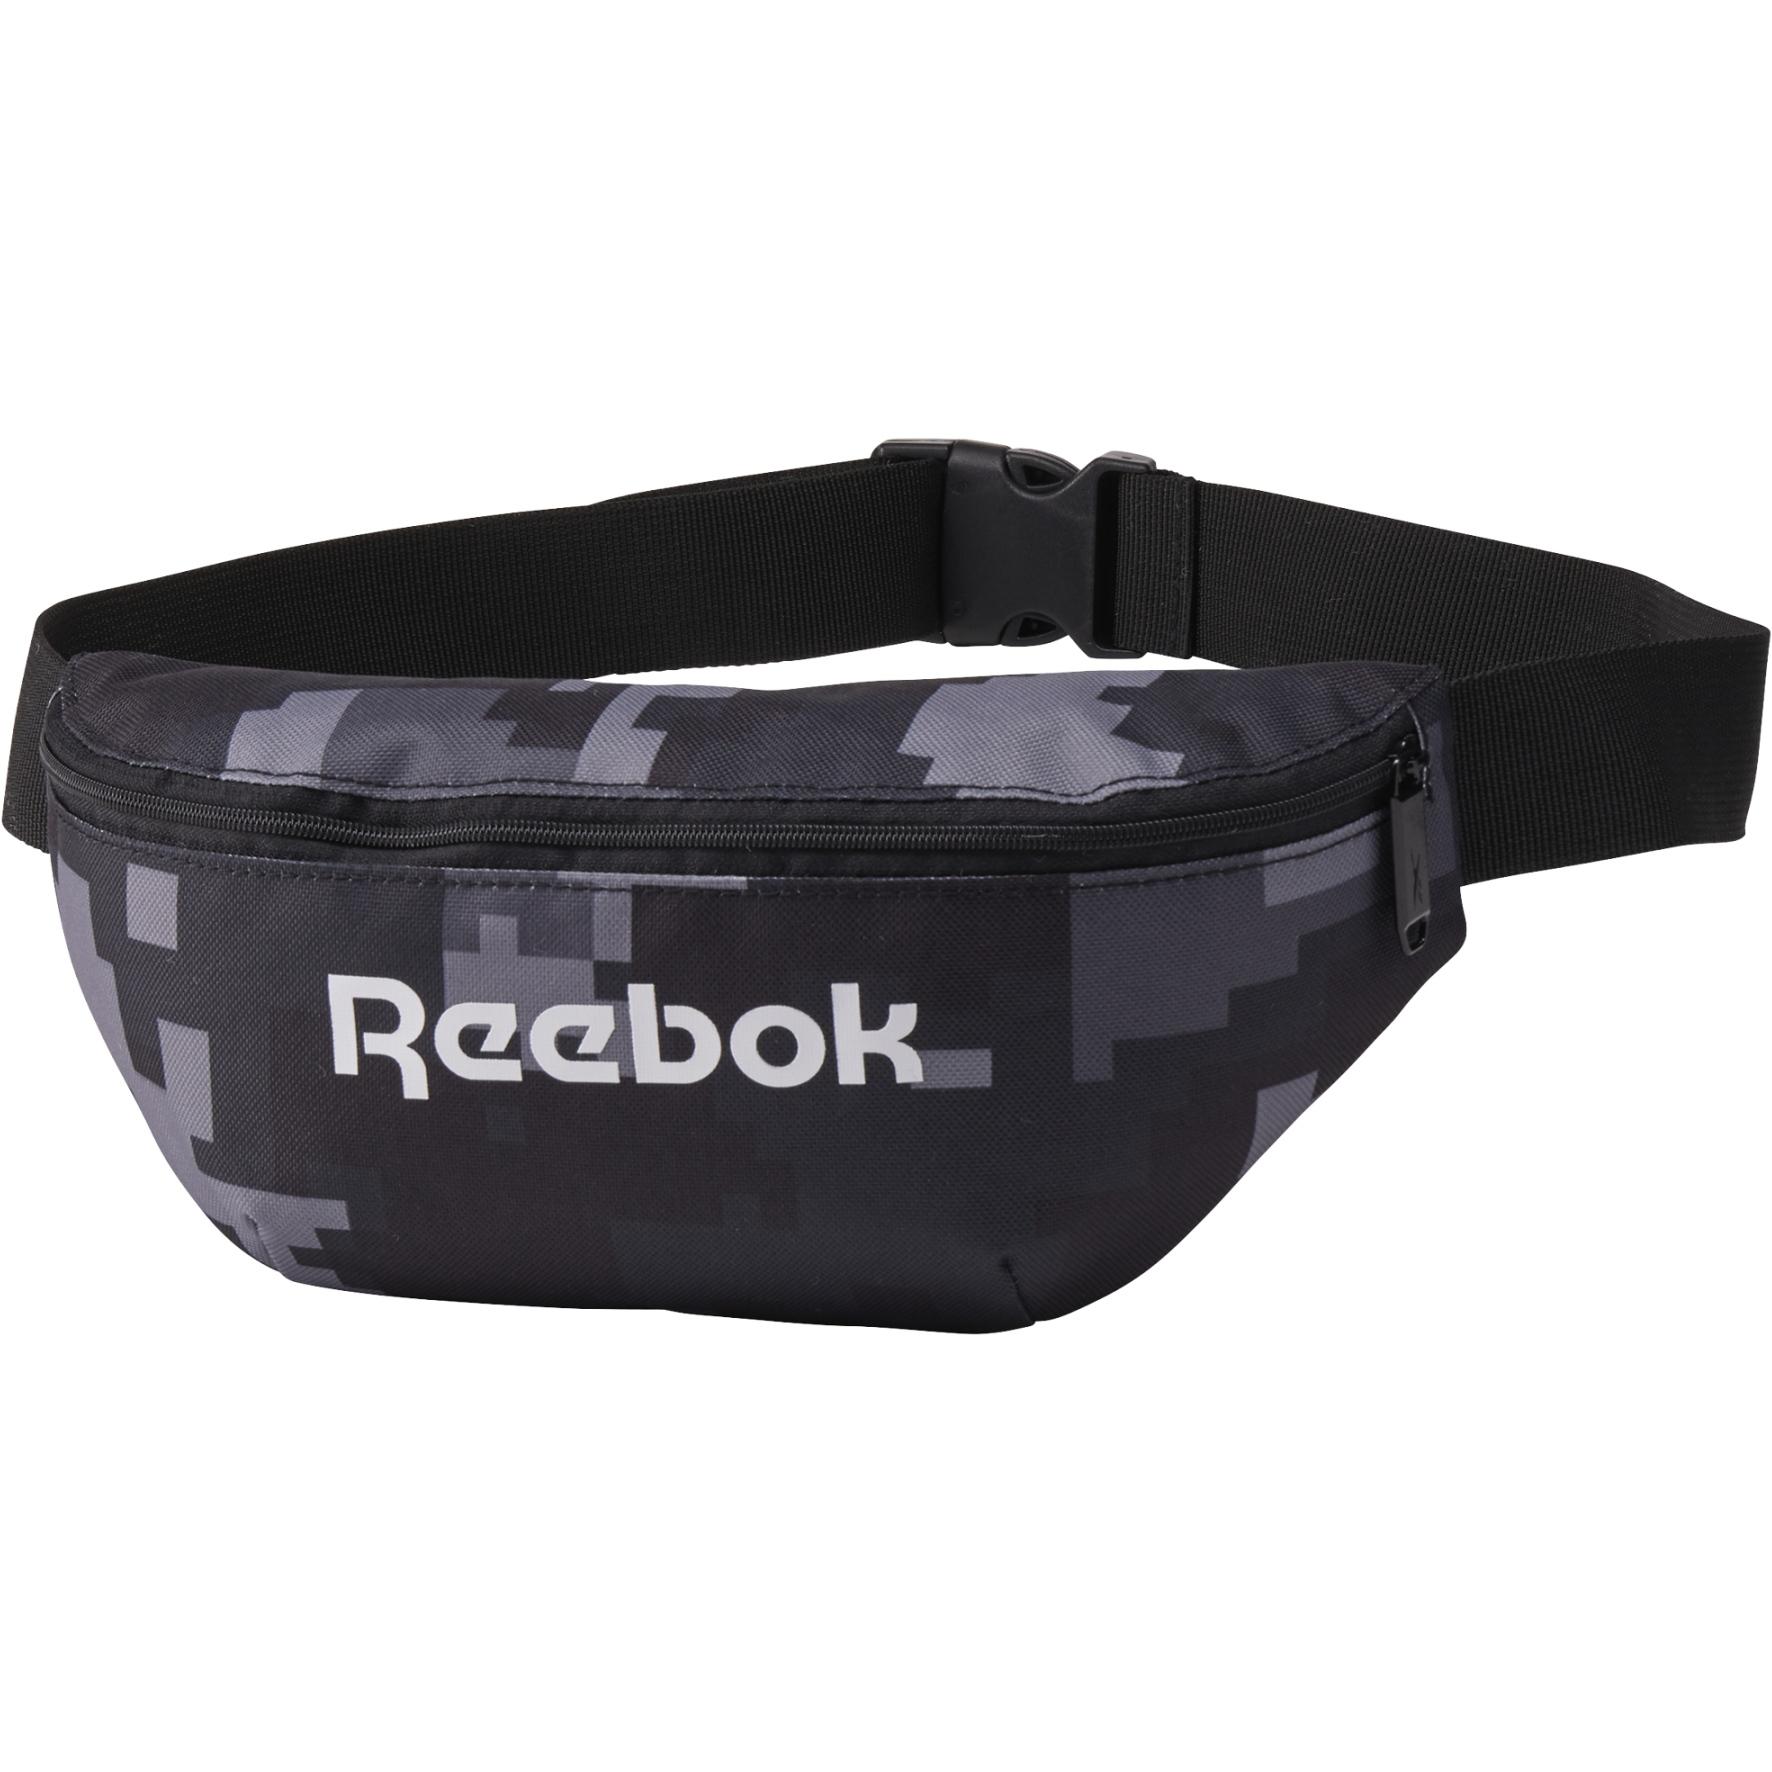 Reebok Act Core Graphic Waist Bag - black